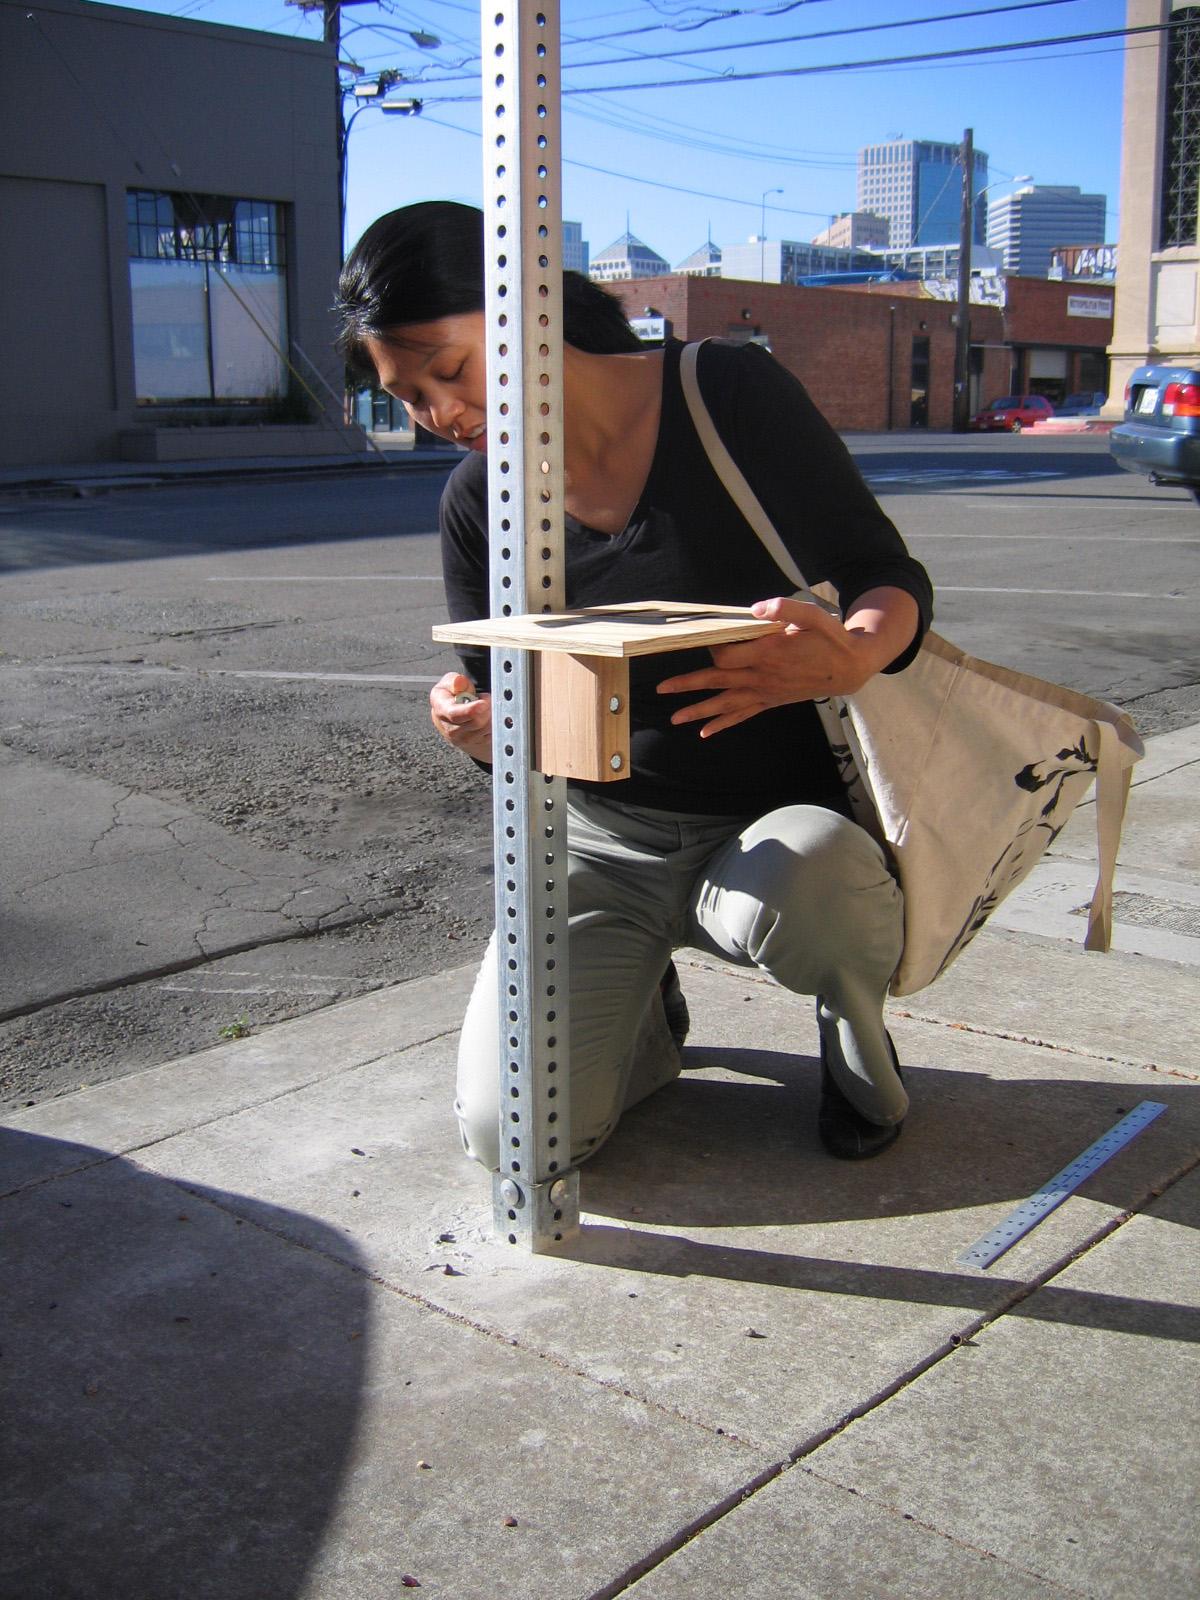 Diy urban design from guerrilla gardening to yarn bombing good solutioingenieria Choice Image